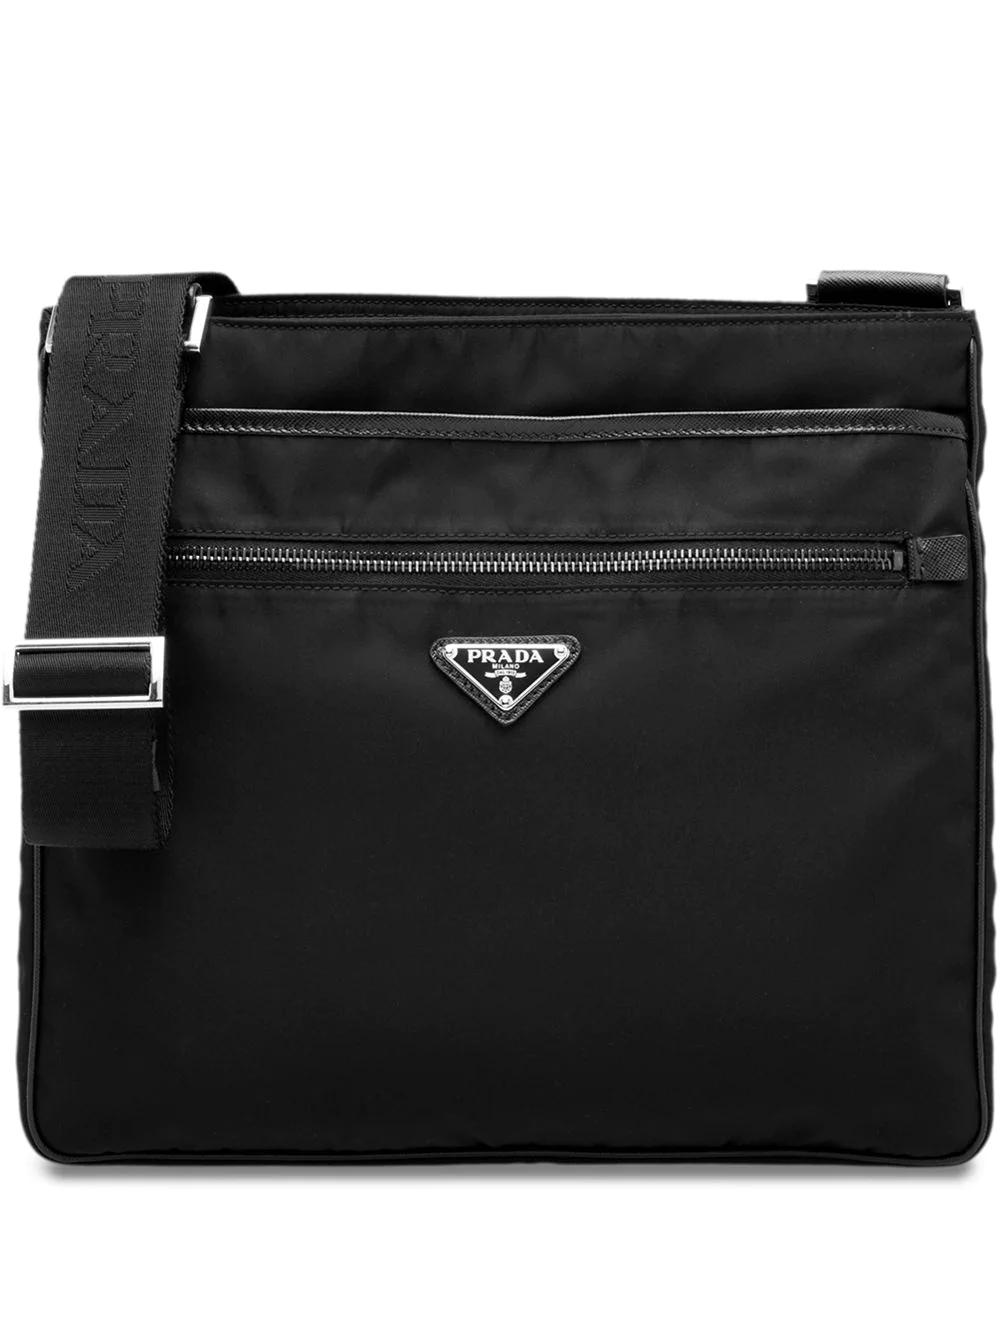 PRADA | сумка-мессенджер с бляшкой с логотипом | Clouty